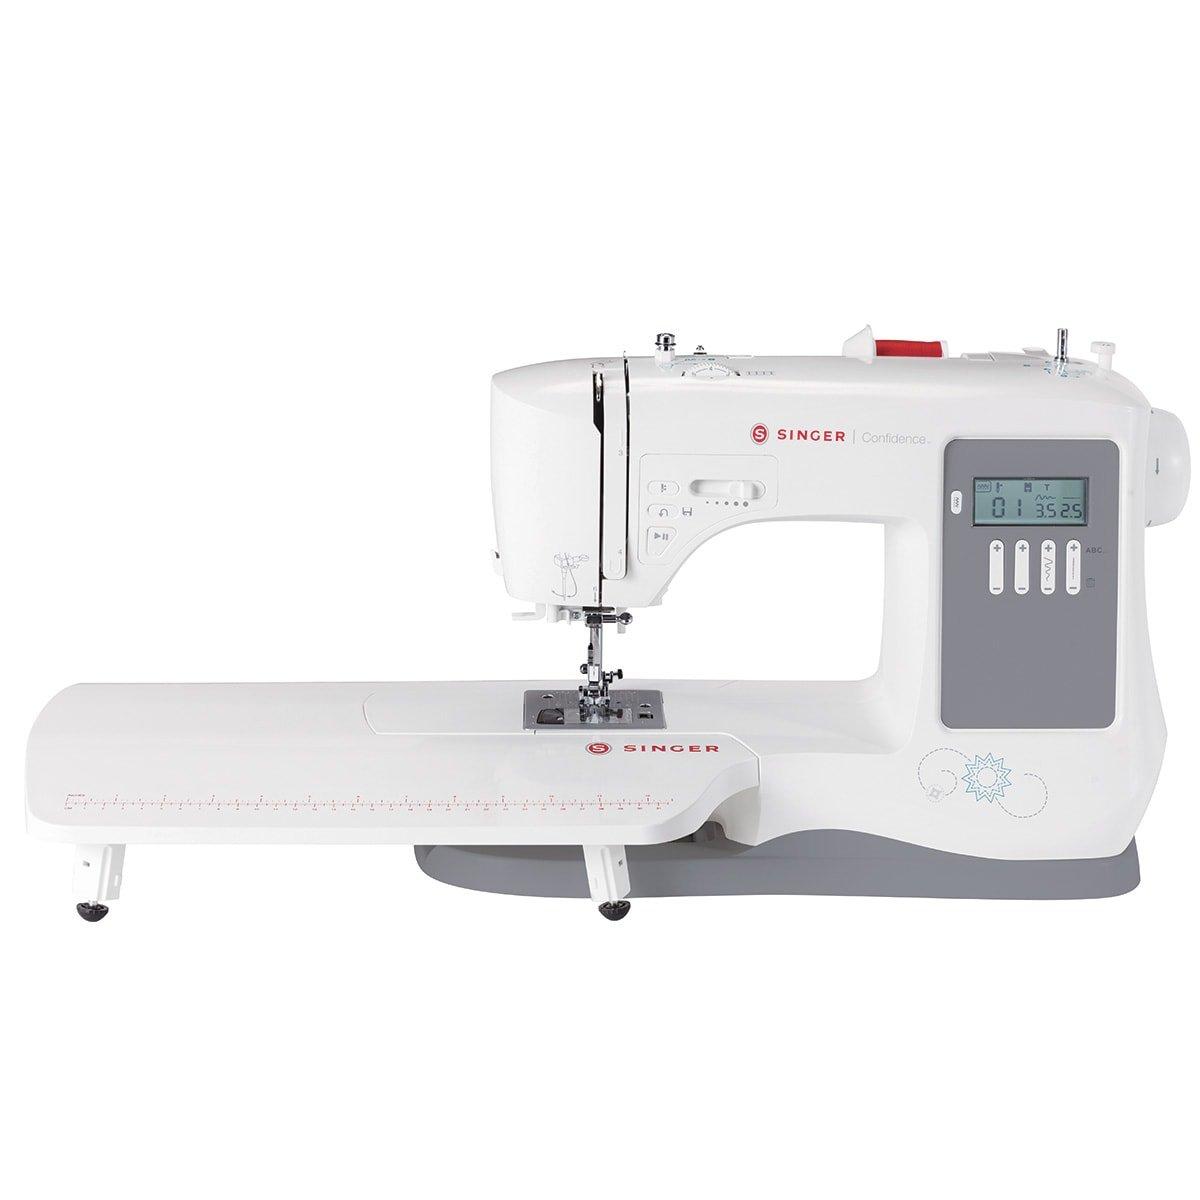 Singer - Confidence 7640Q - Sewing Machine